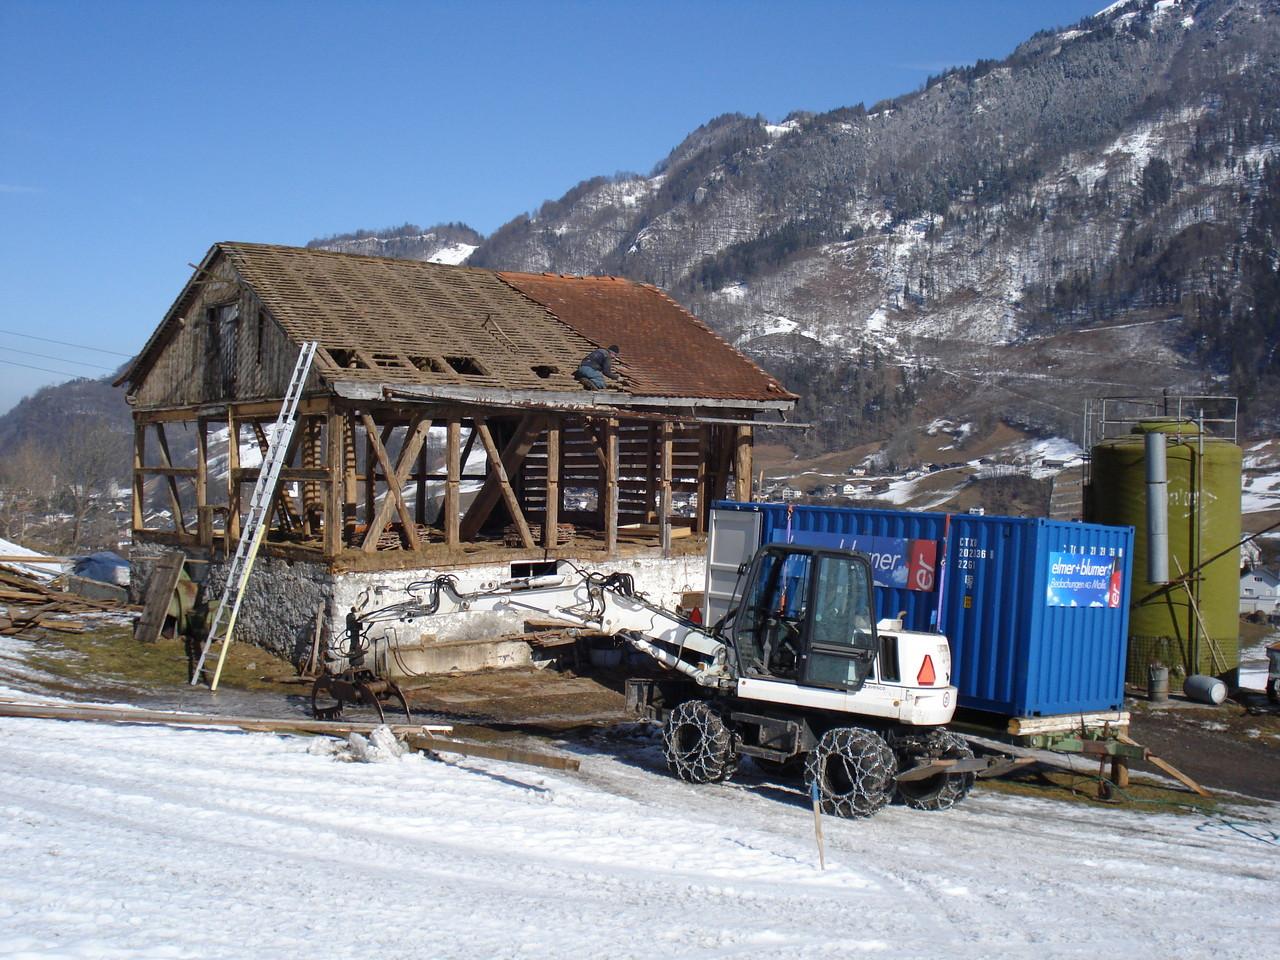 Stall 2012 (alt), Glarus